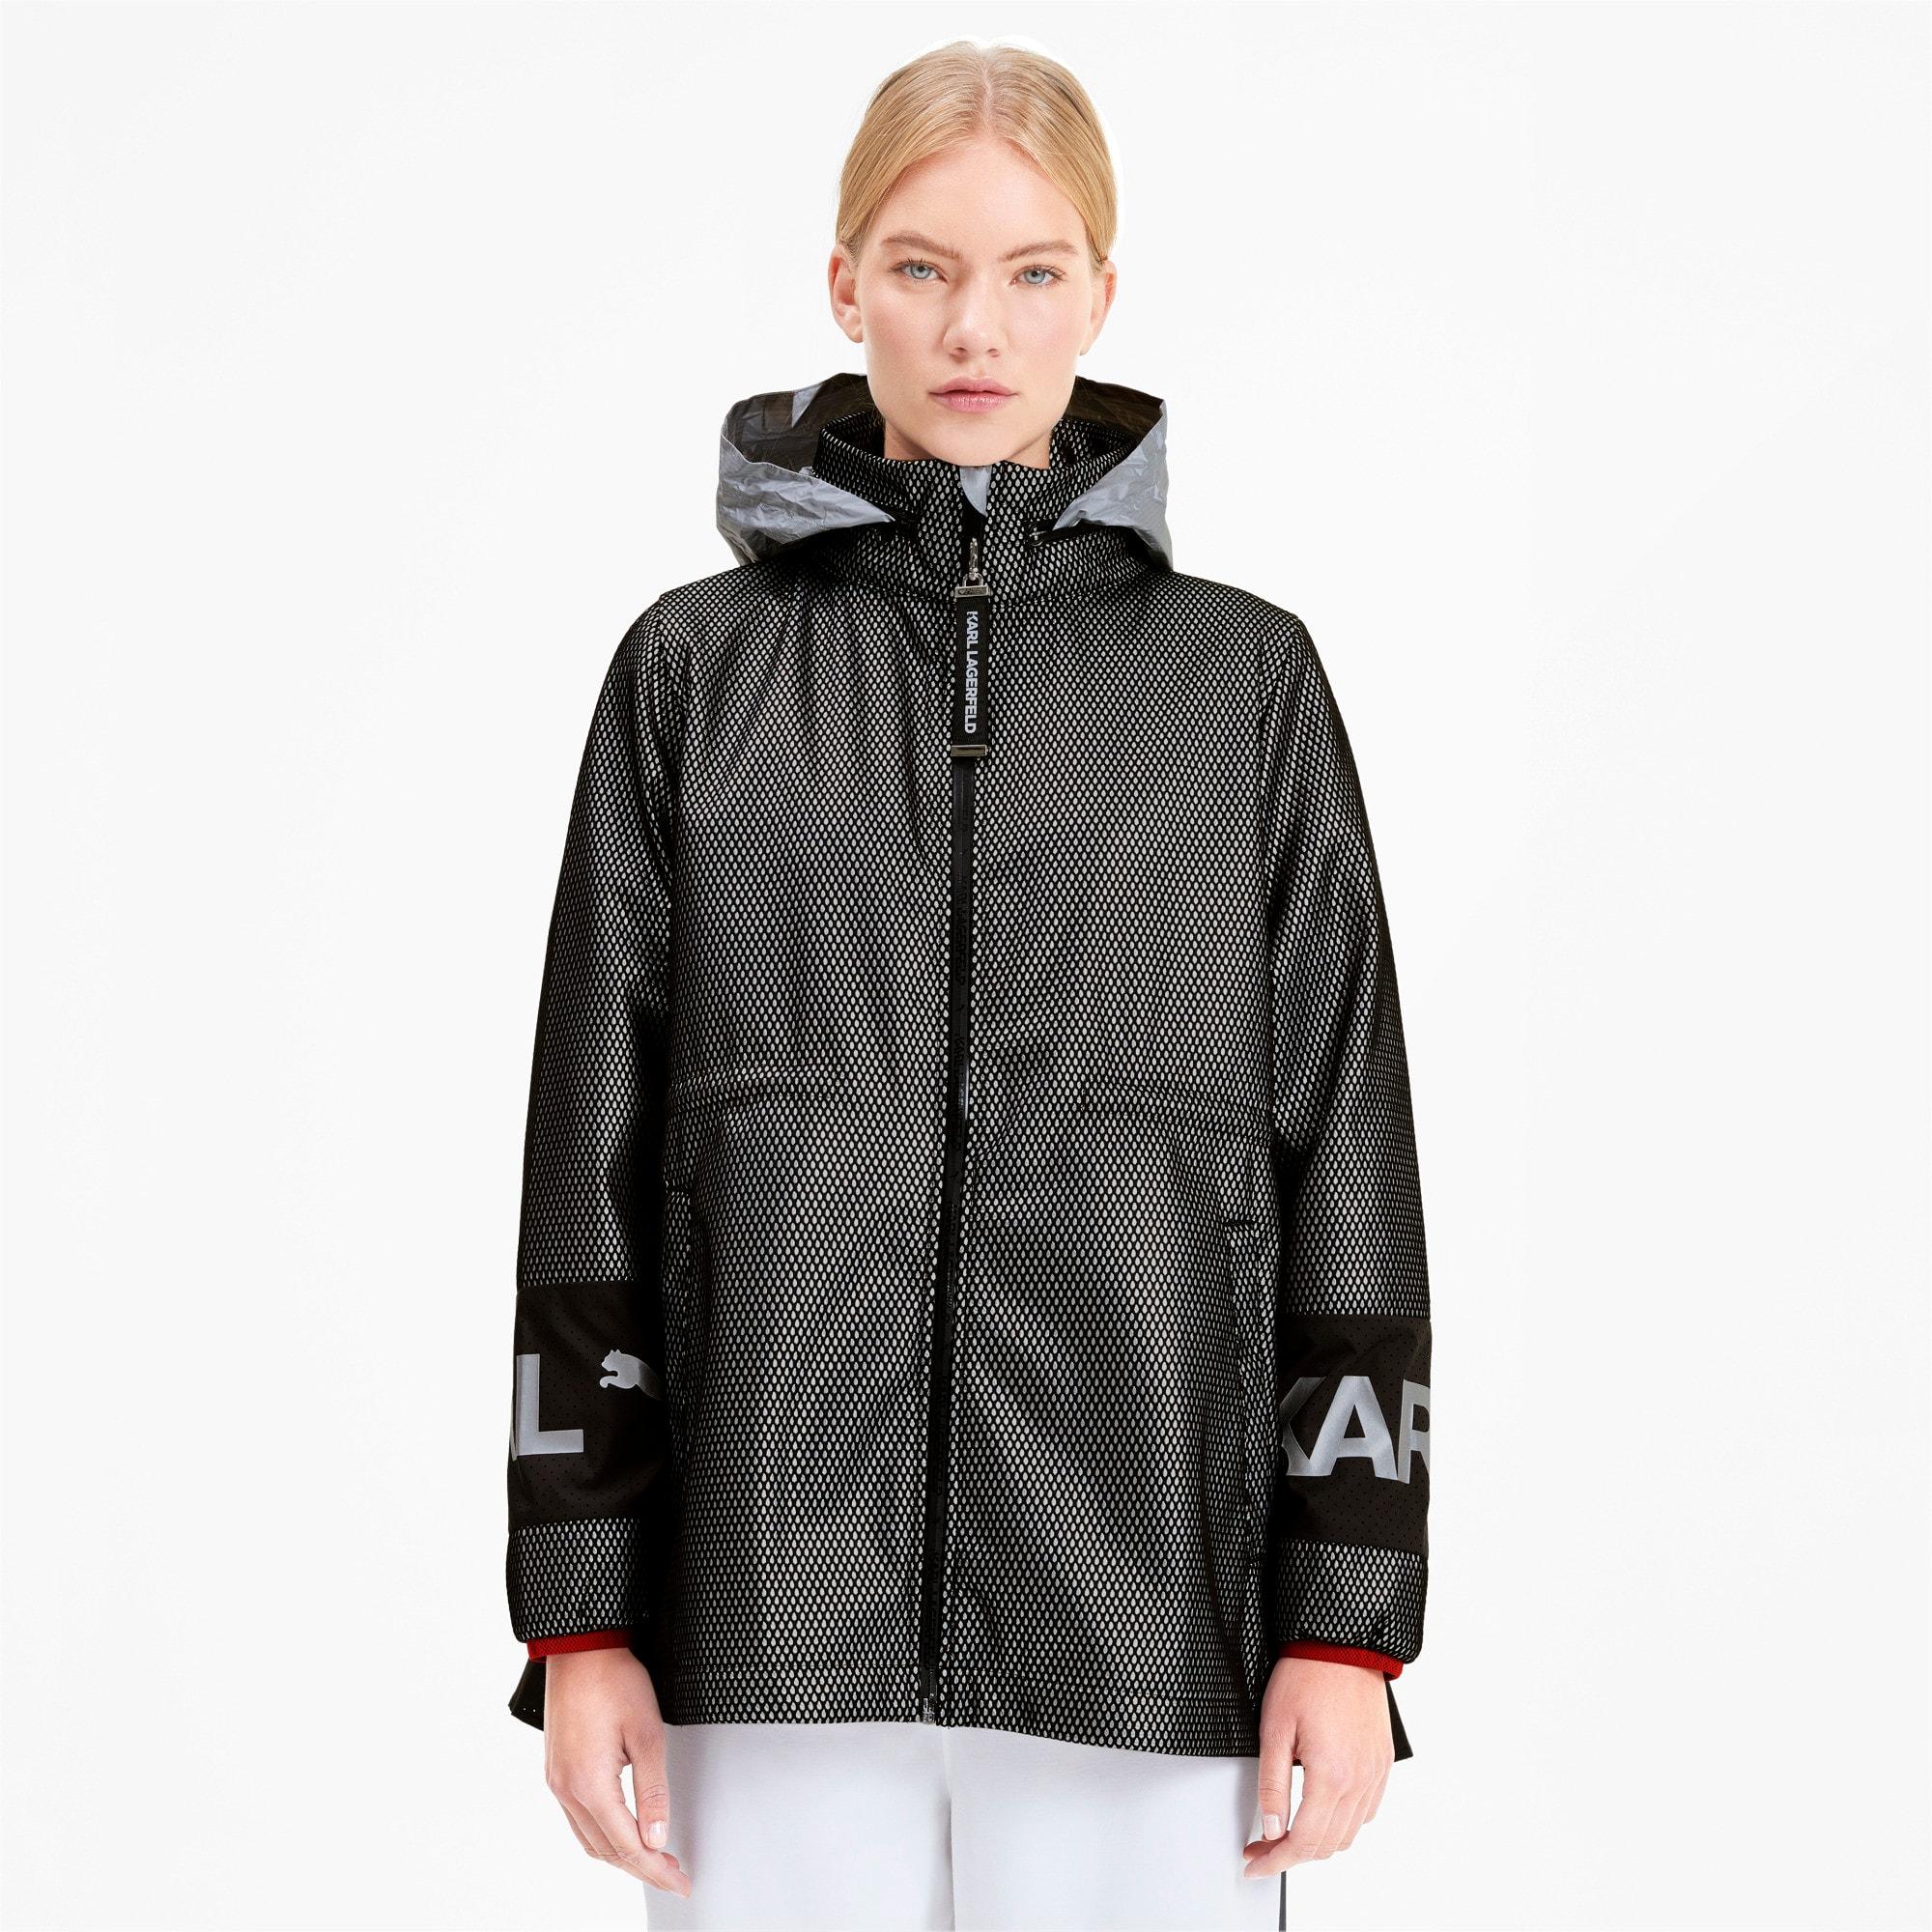 Thumbnail 1 of PUMA x KARL LAGERFELD Women's Outerwear Jacket, Puma Black, medium